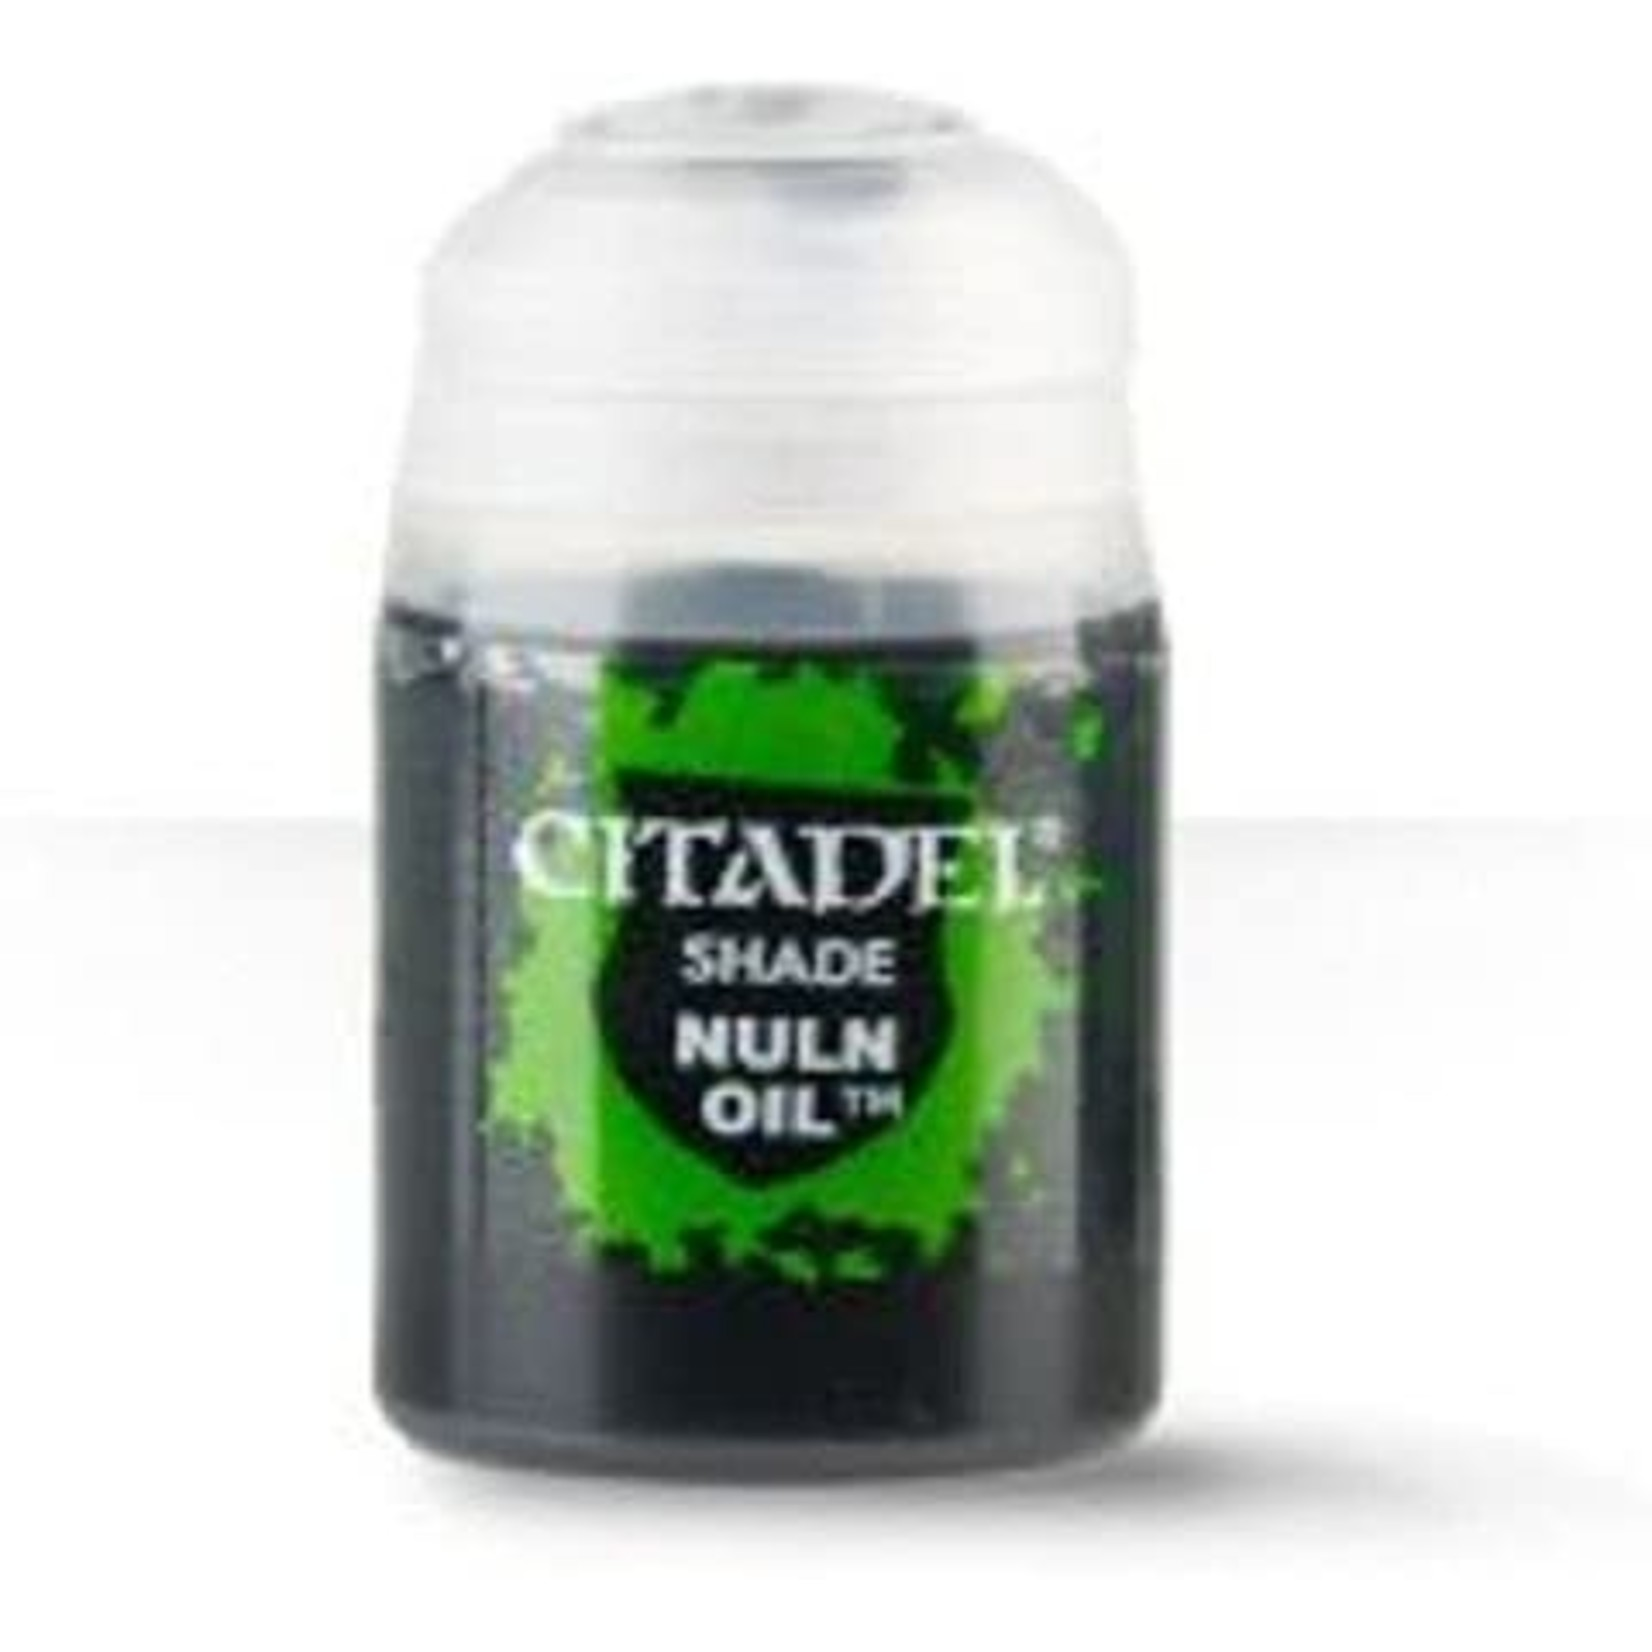 Citadel Paint: Nuln Oil 24ml